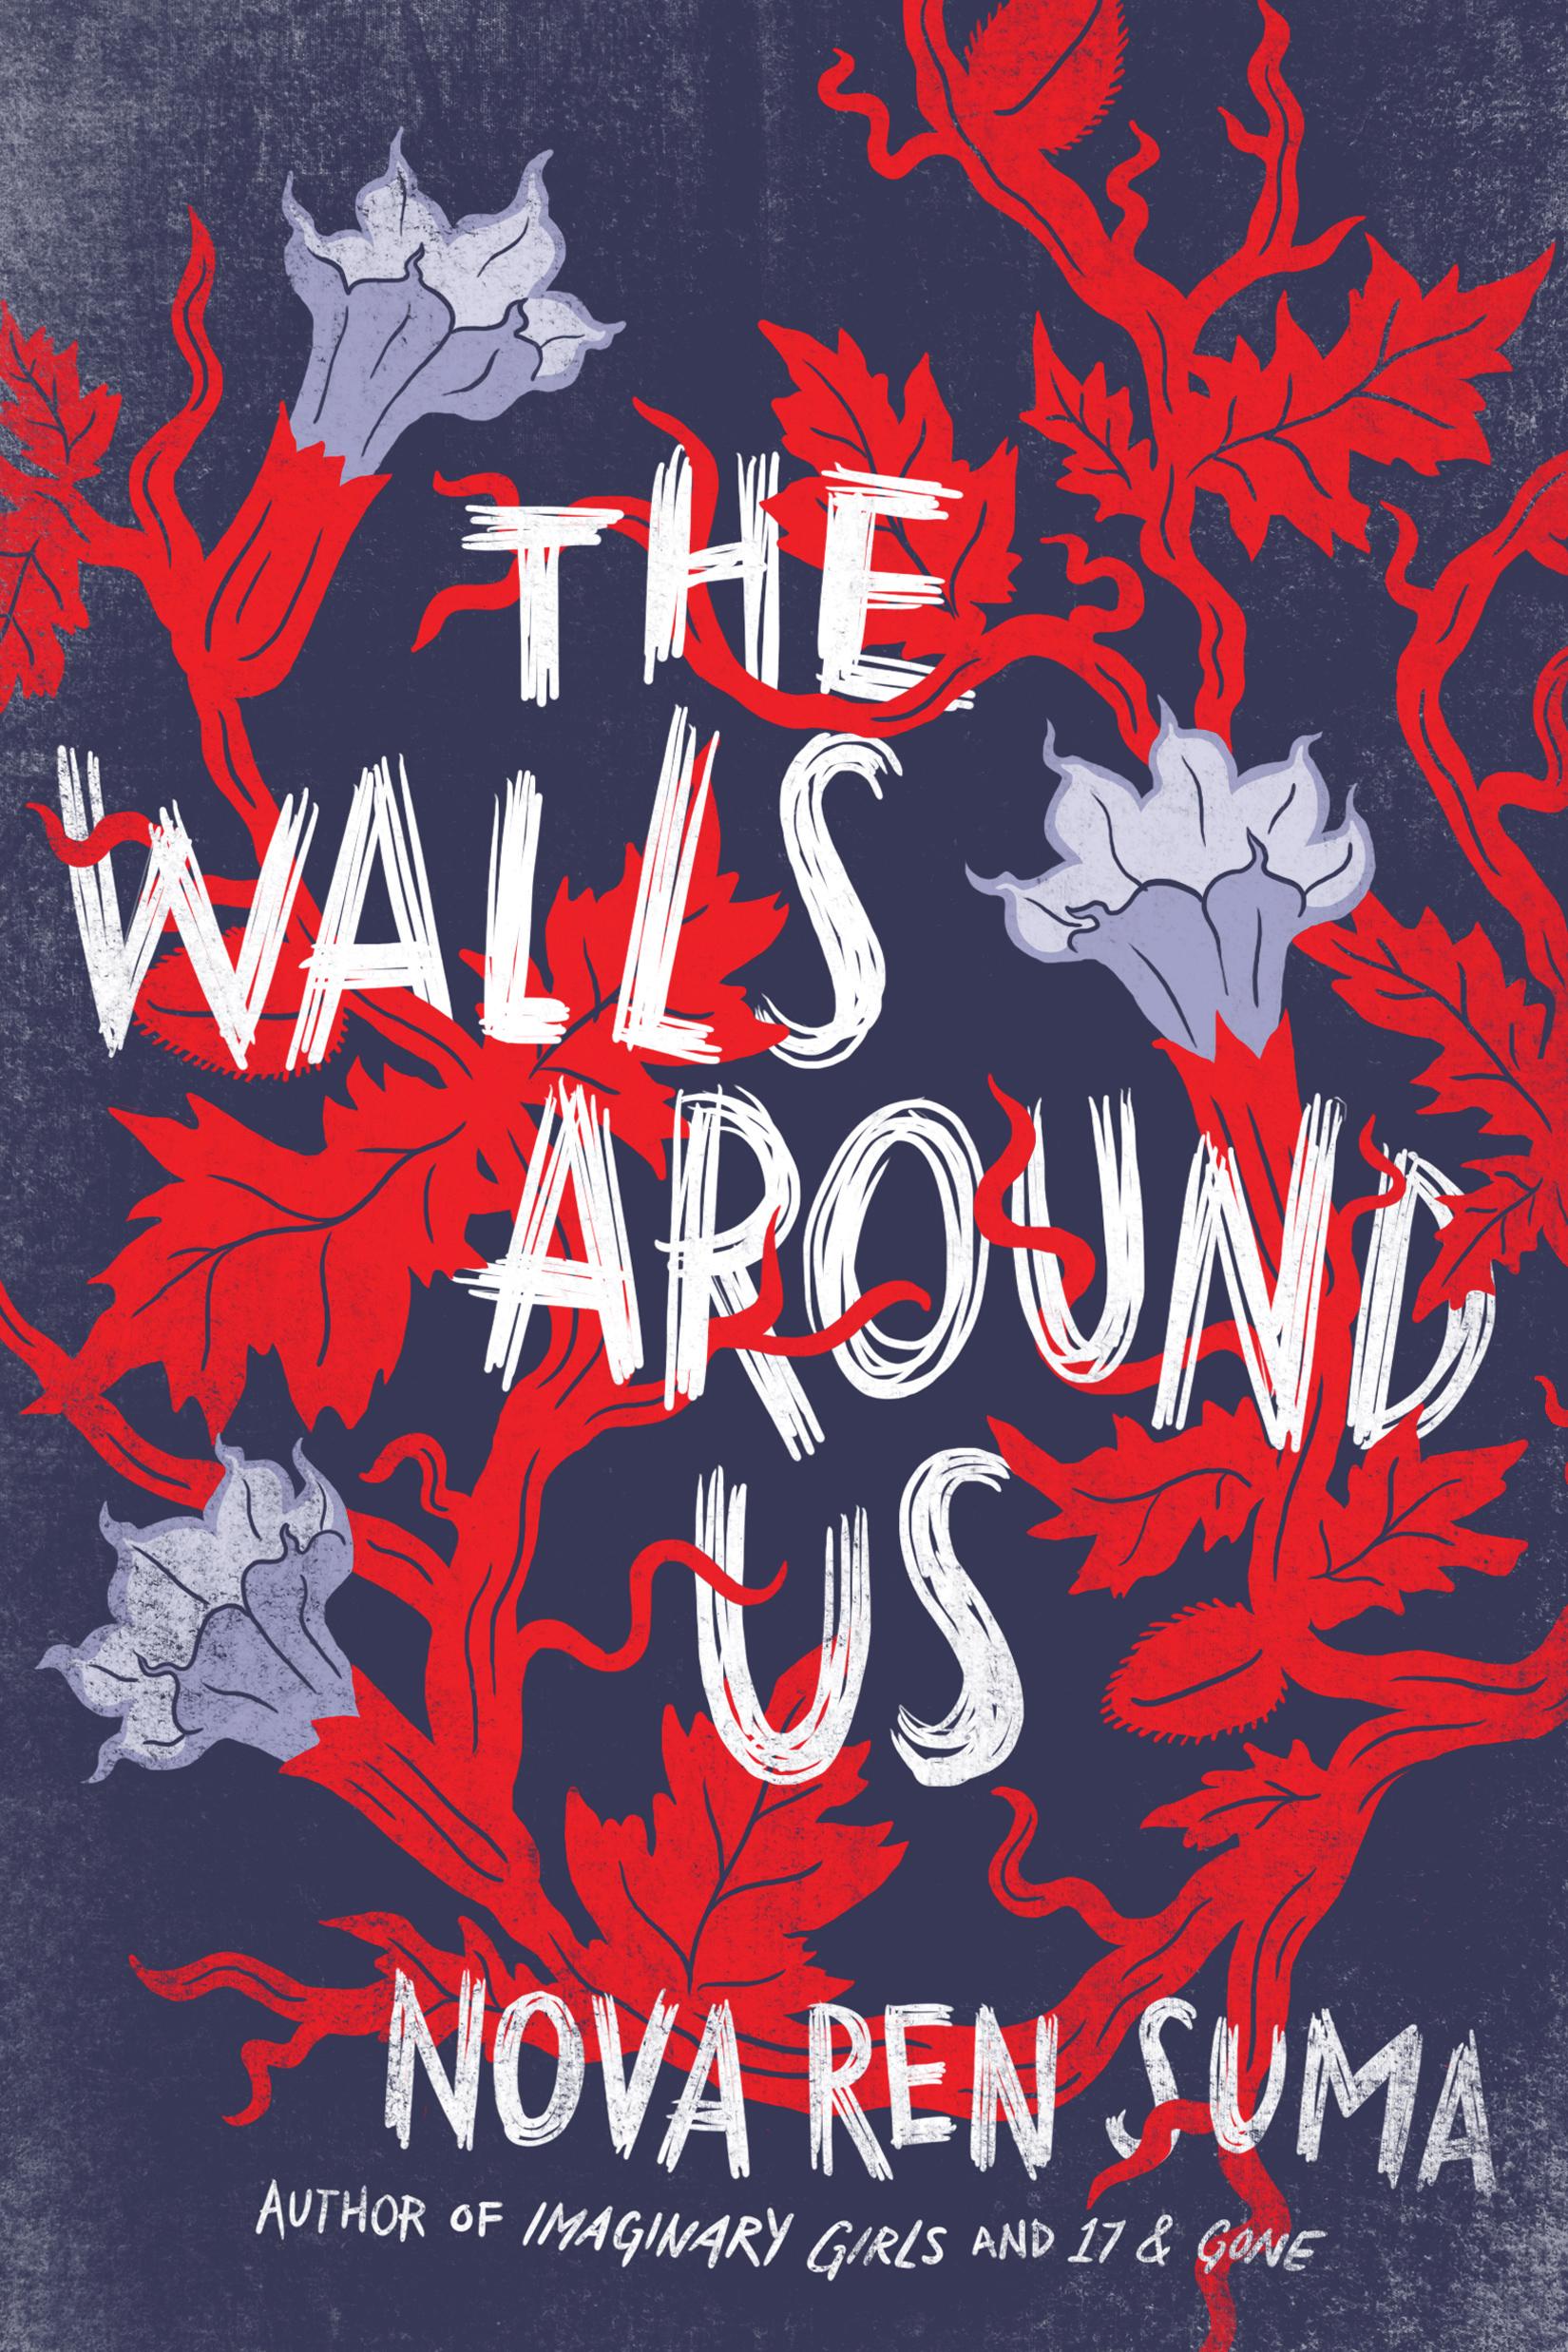 The Walls Around Us, by Nova Ren Suma